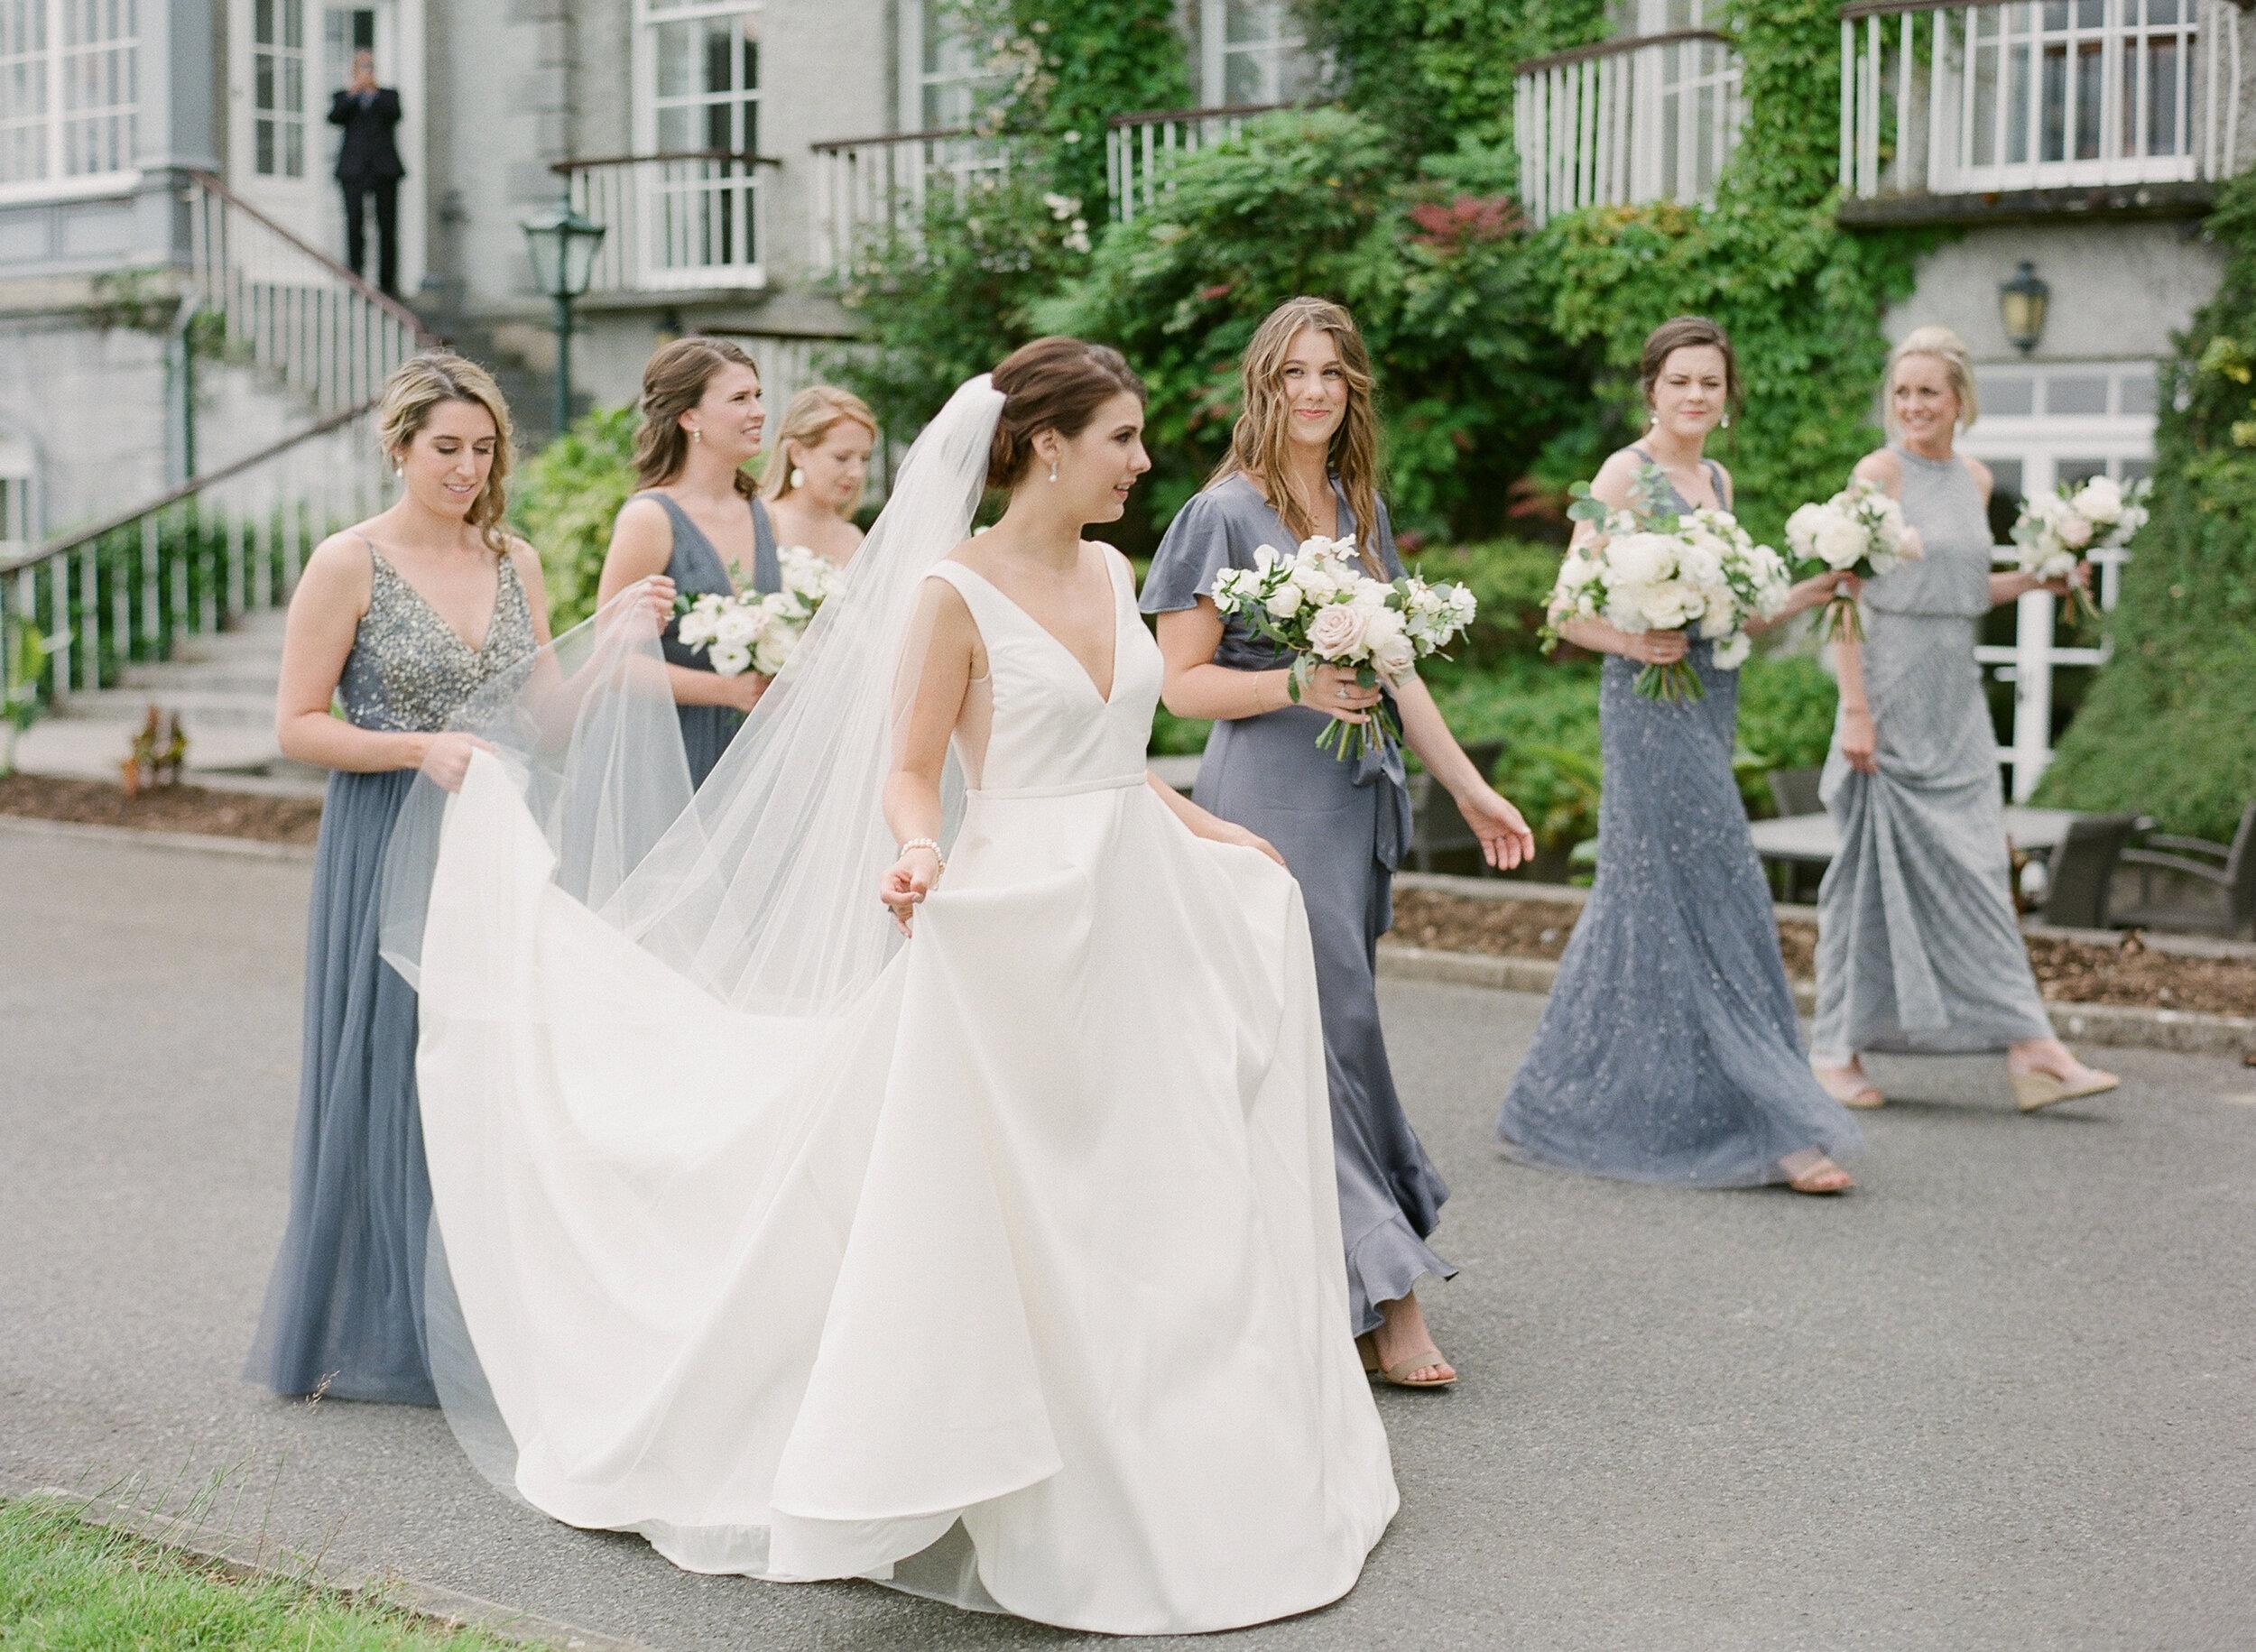 Bella-Botanica-Flowers-Bride-Bridesmaids-Forals.